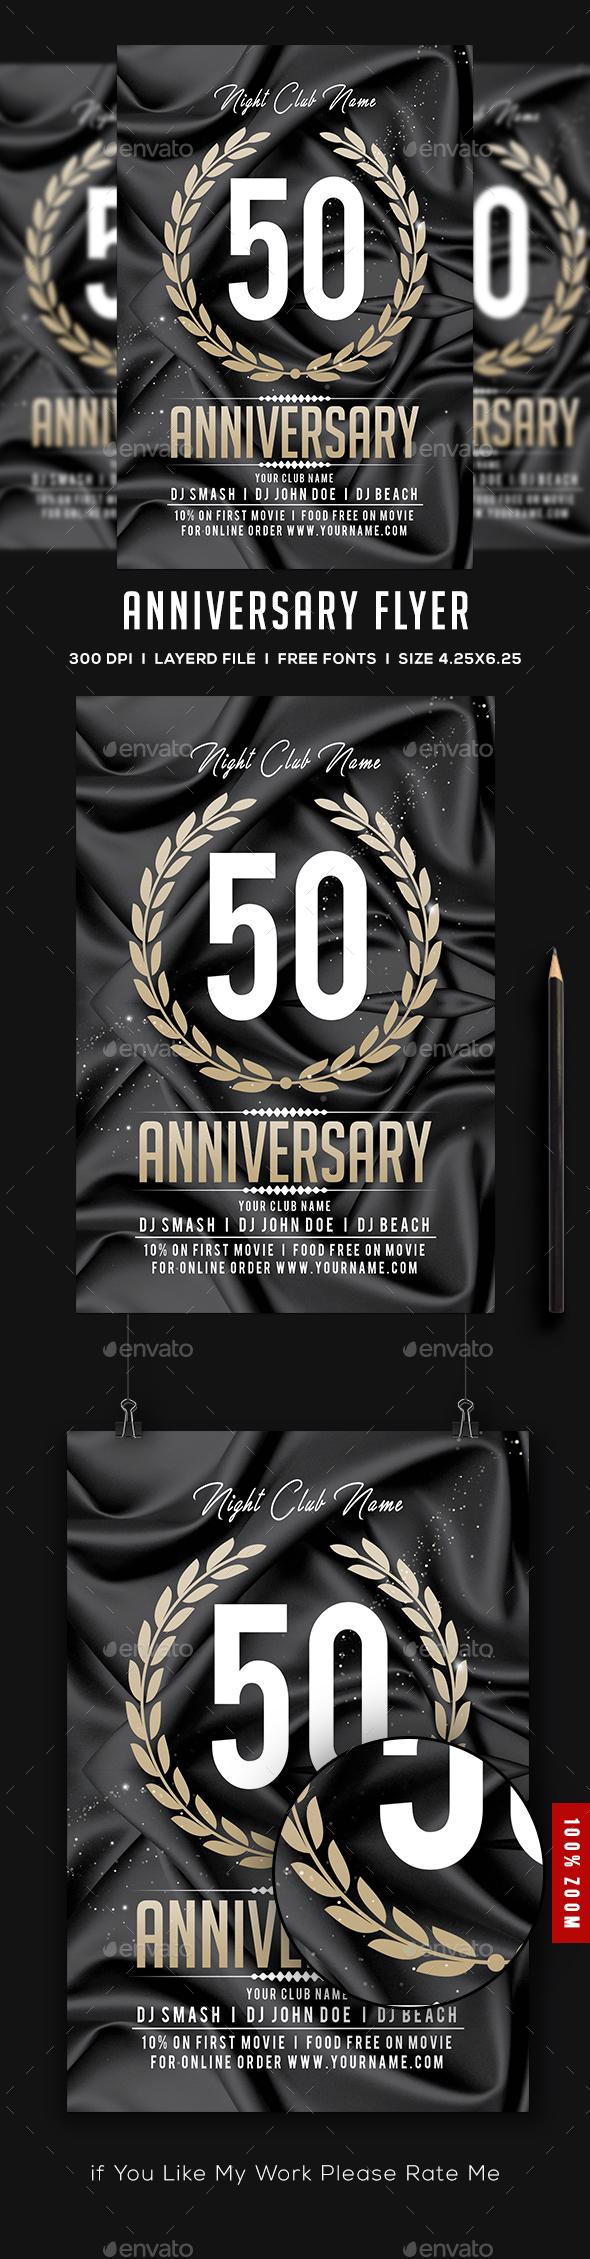 Anniversary Flyer - Flyers Print Templates